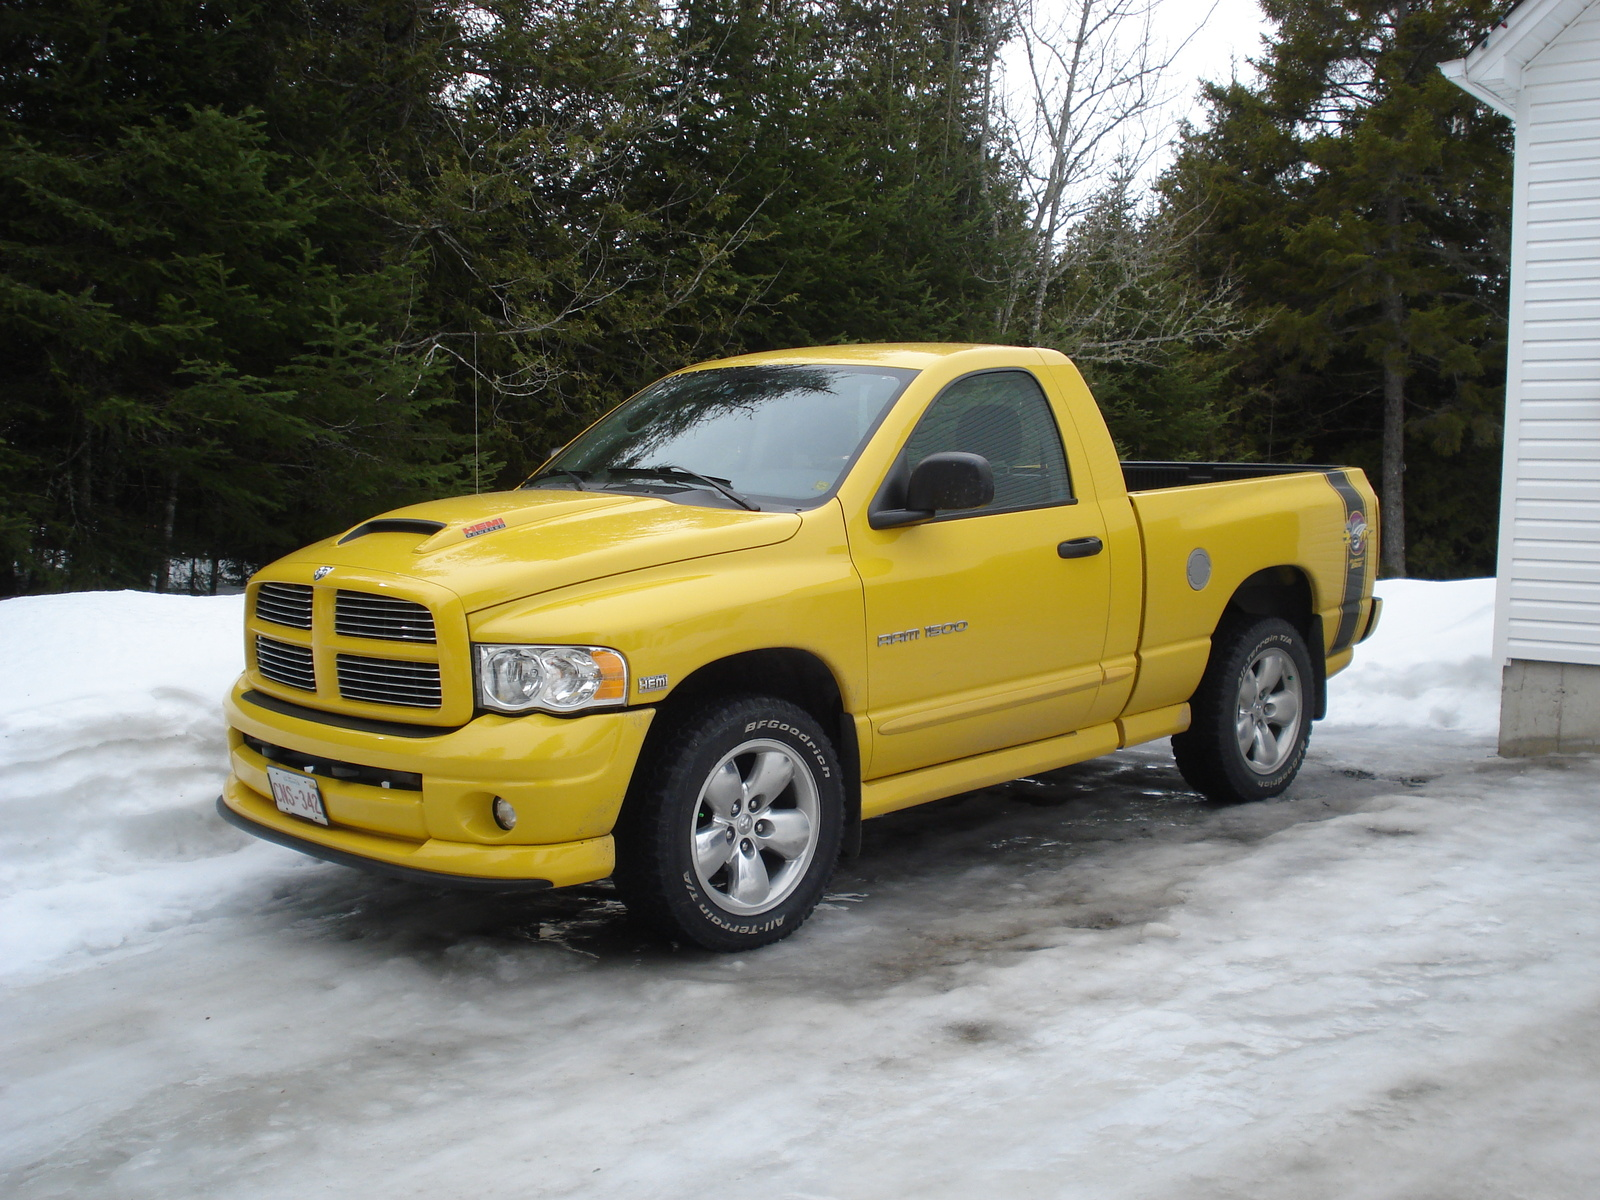 2005 Dodge Ram Pickup 1500 2 Dr Laramie 4WD Standard Cab SB picture